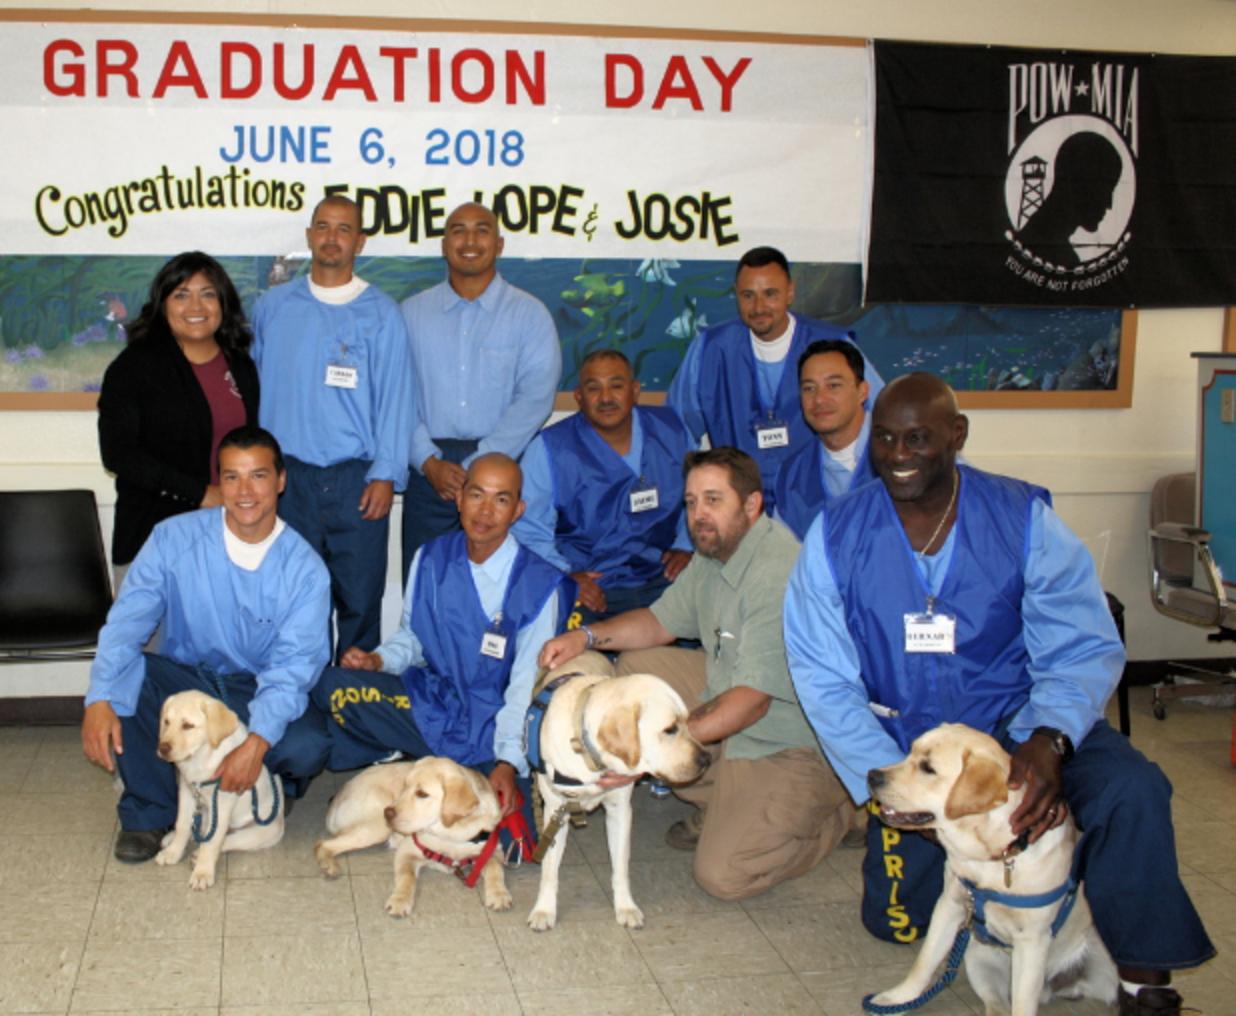 New Life K9s Graduation